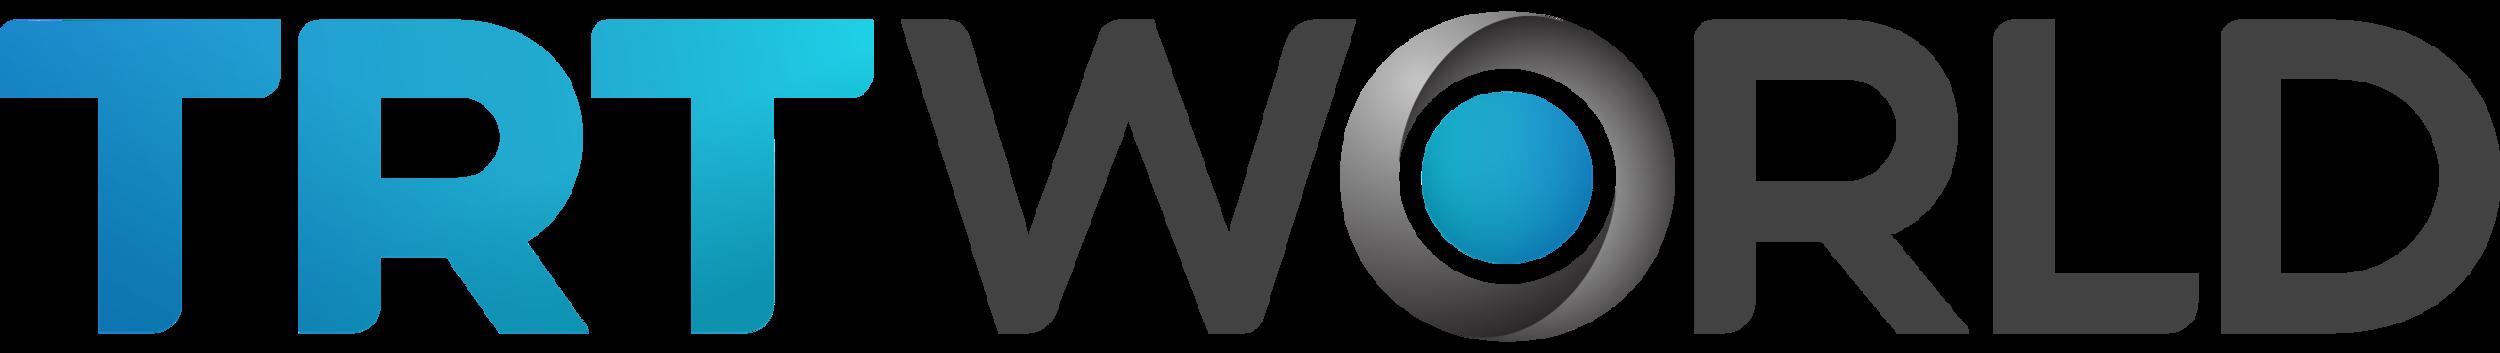 logo-trt.png